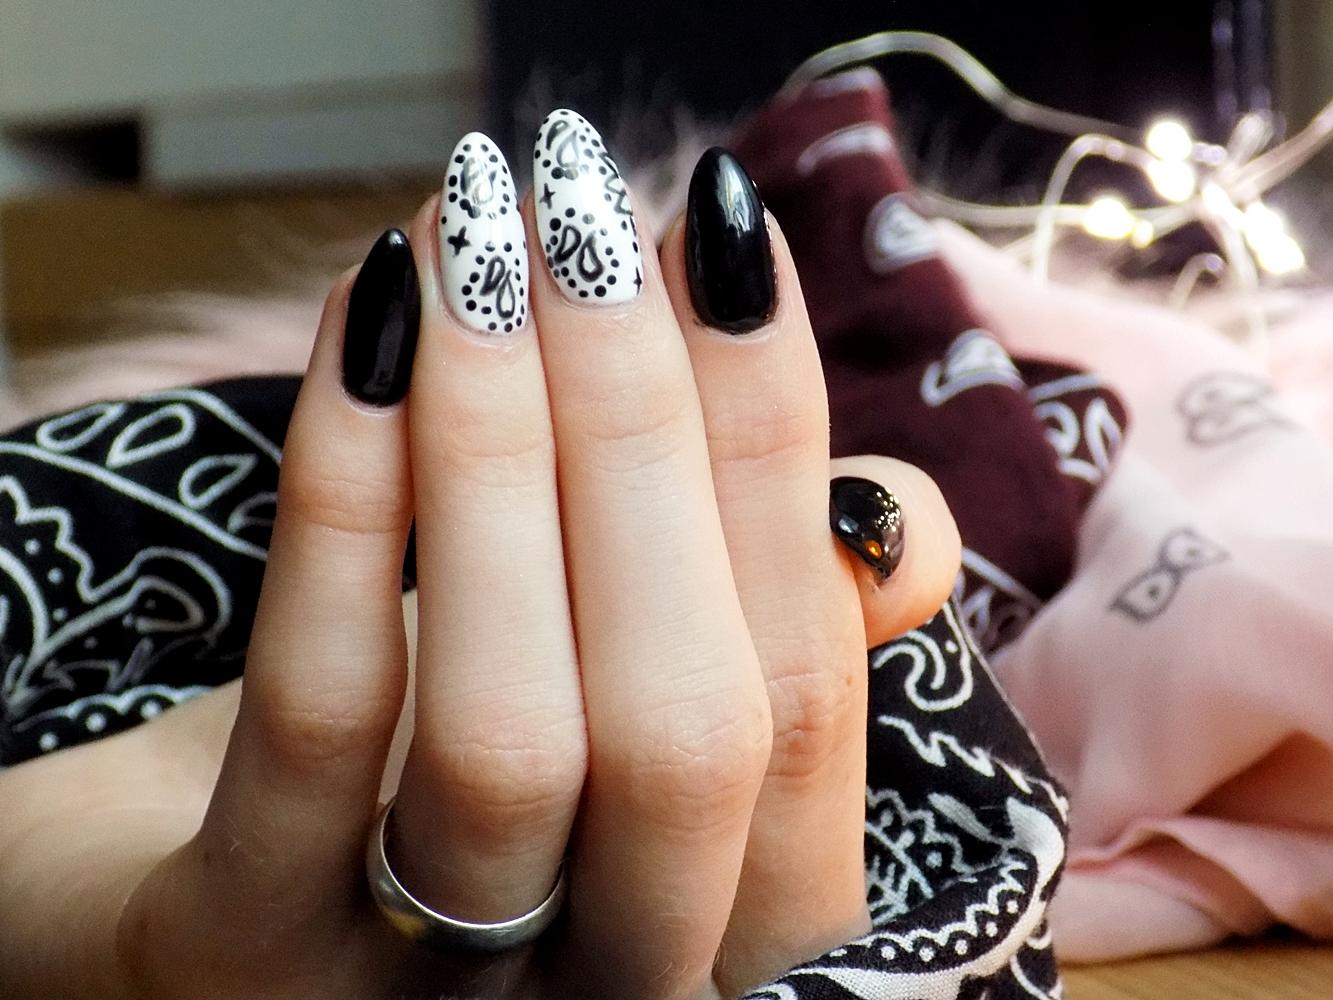 Paznokcie inspirowane bandaną | Zdobienie paznokci - Ksanaru